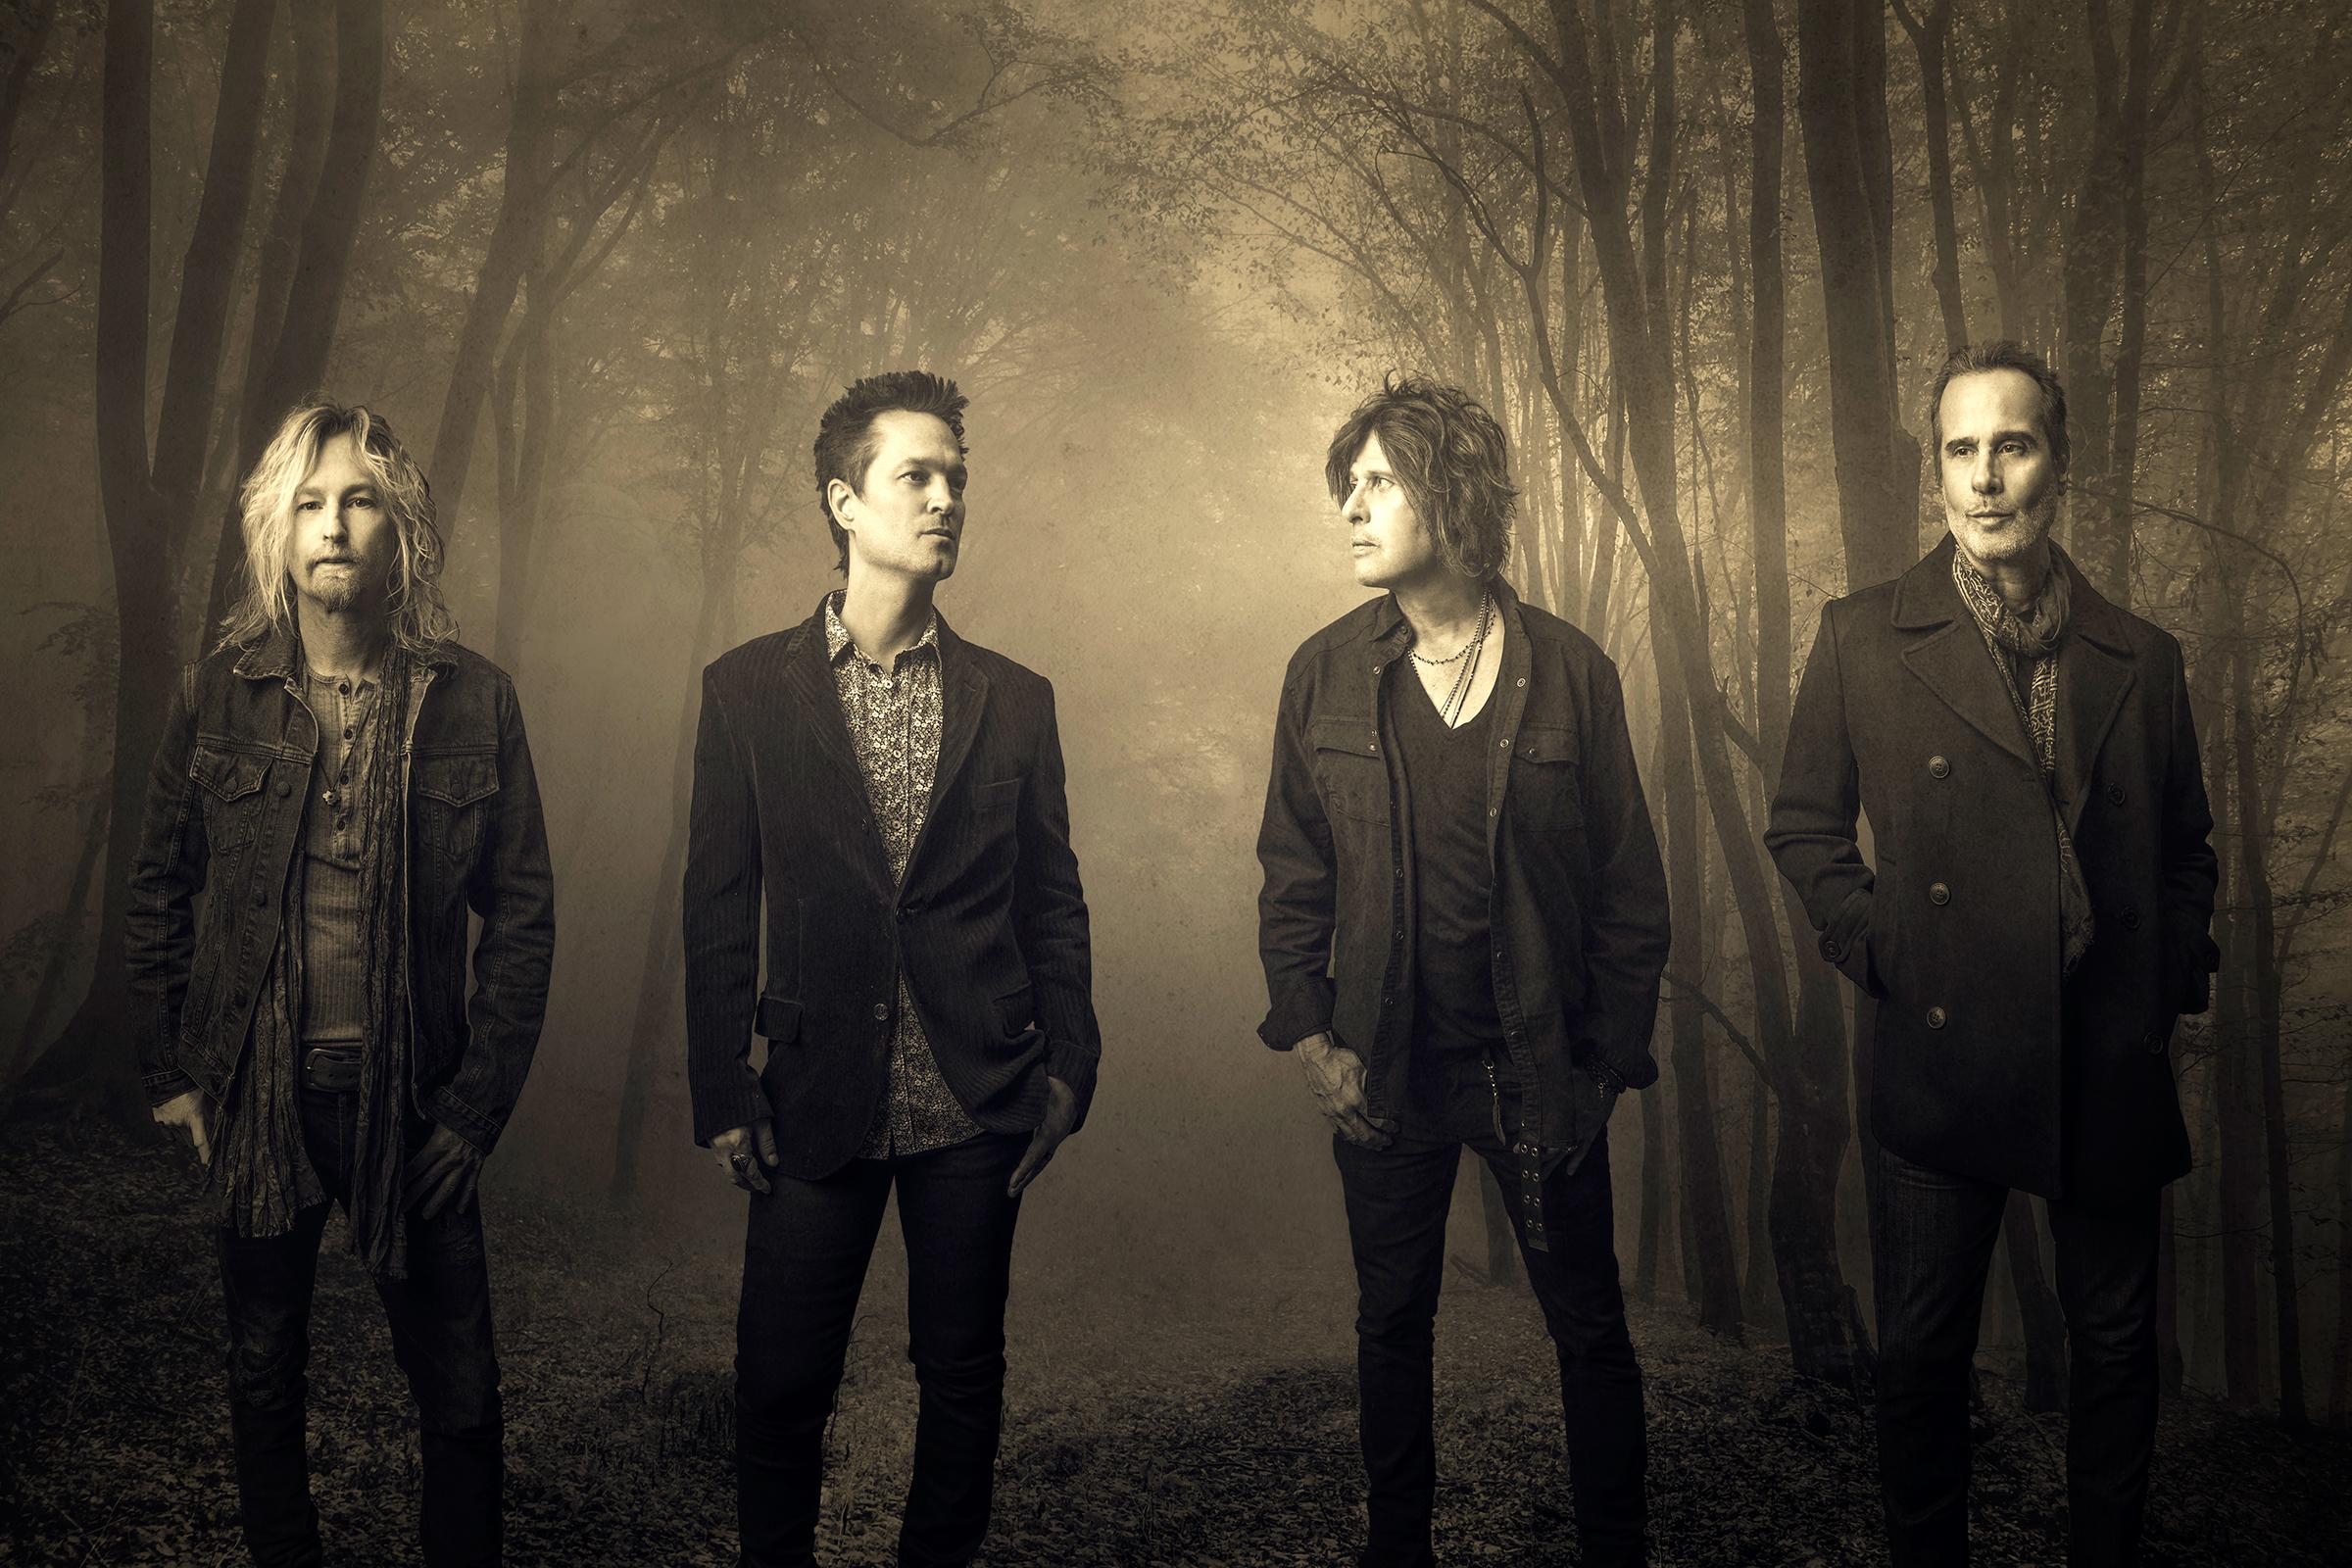 Stone Temple Pilots Unplug and Lose Their Identity on New Album, 'Perdida'